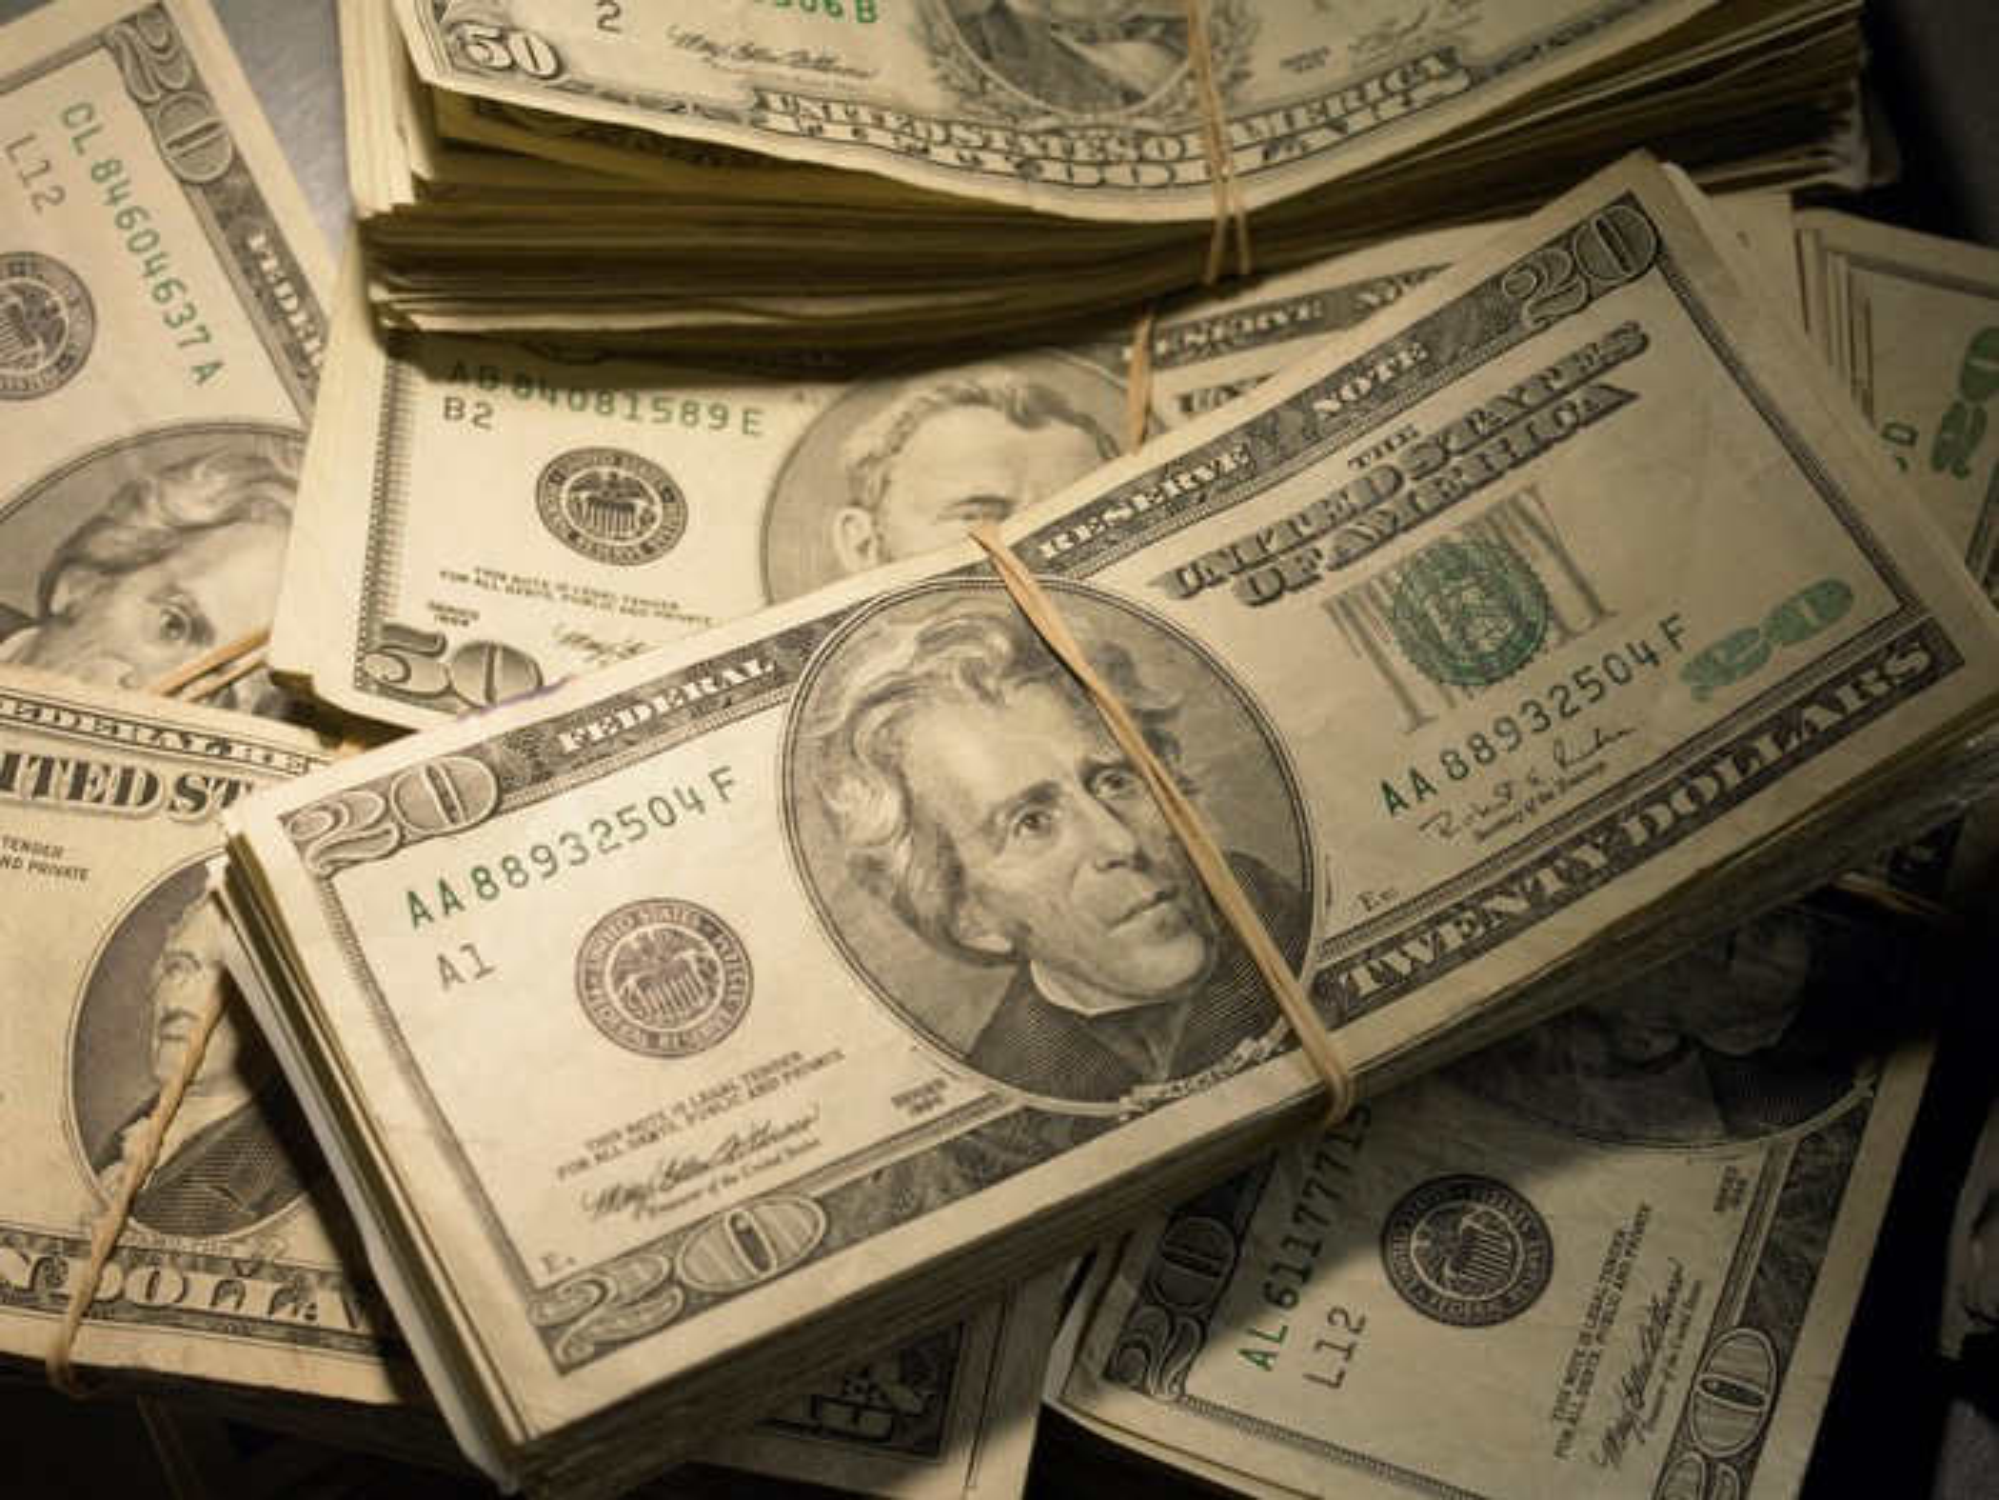 Stacks of cash.